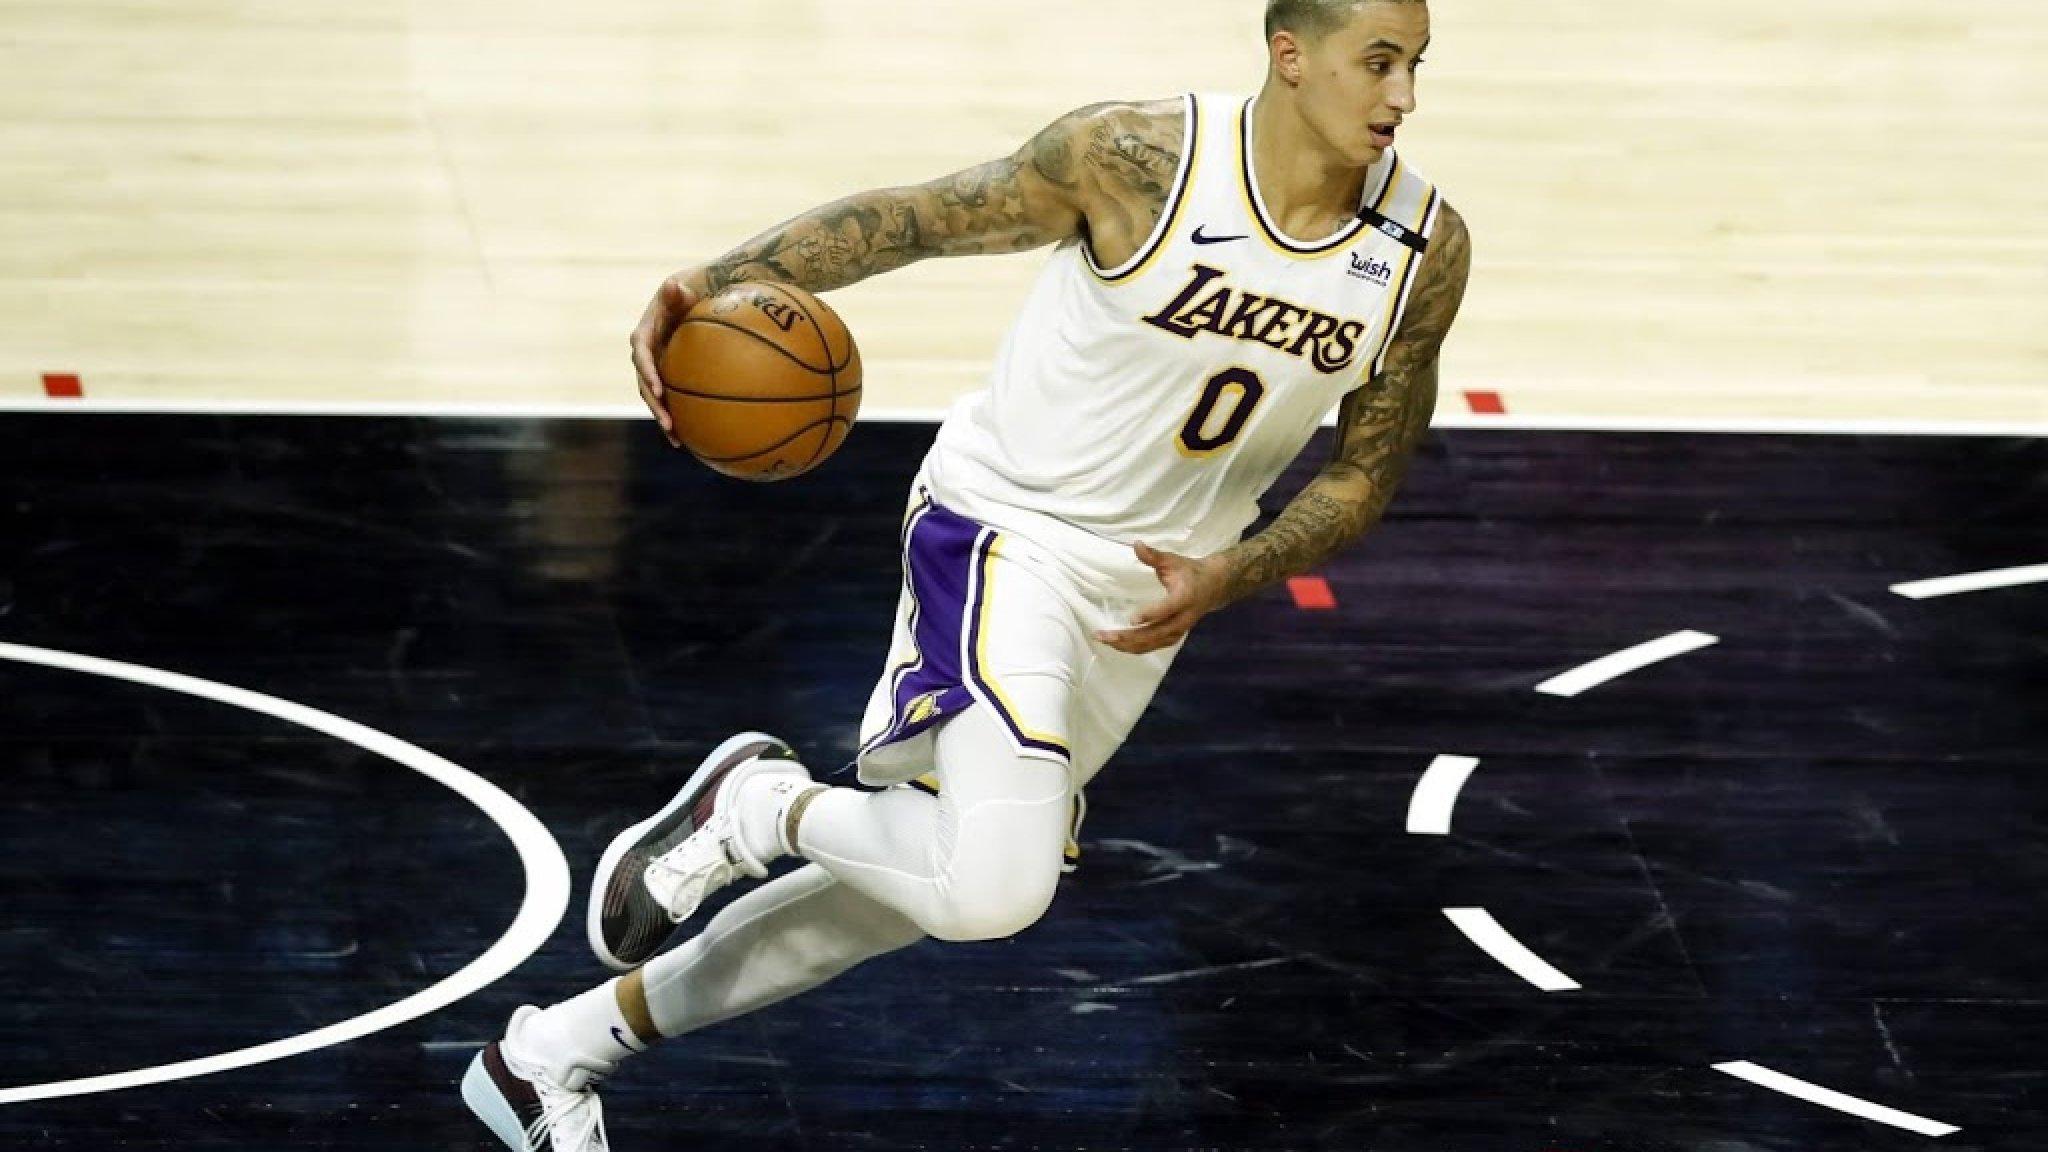 LA Lakers finally beat Raptors again in NBA - Ruetir